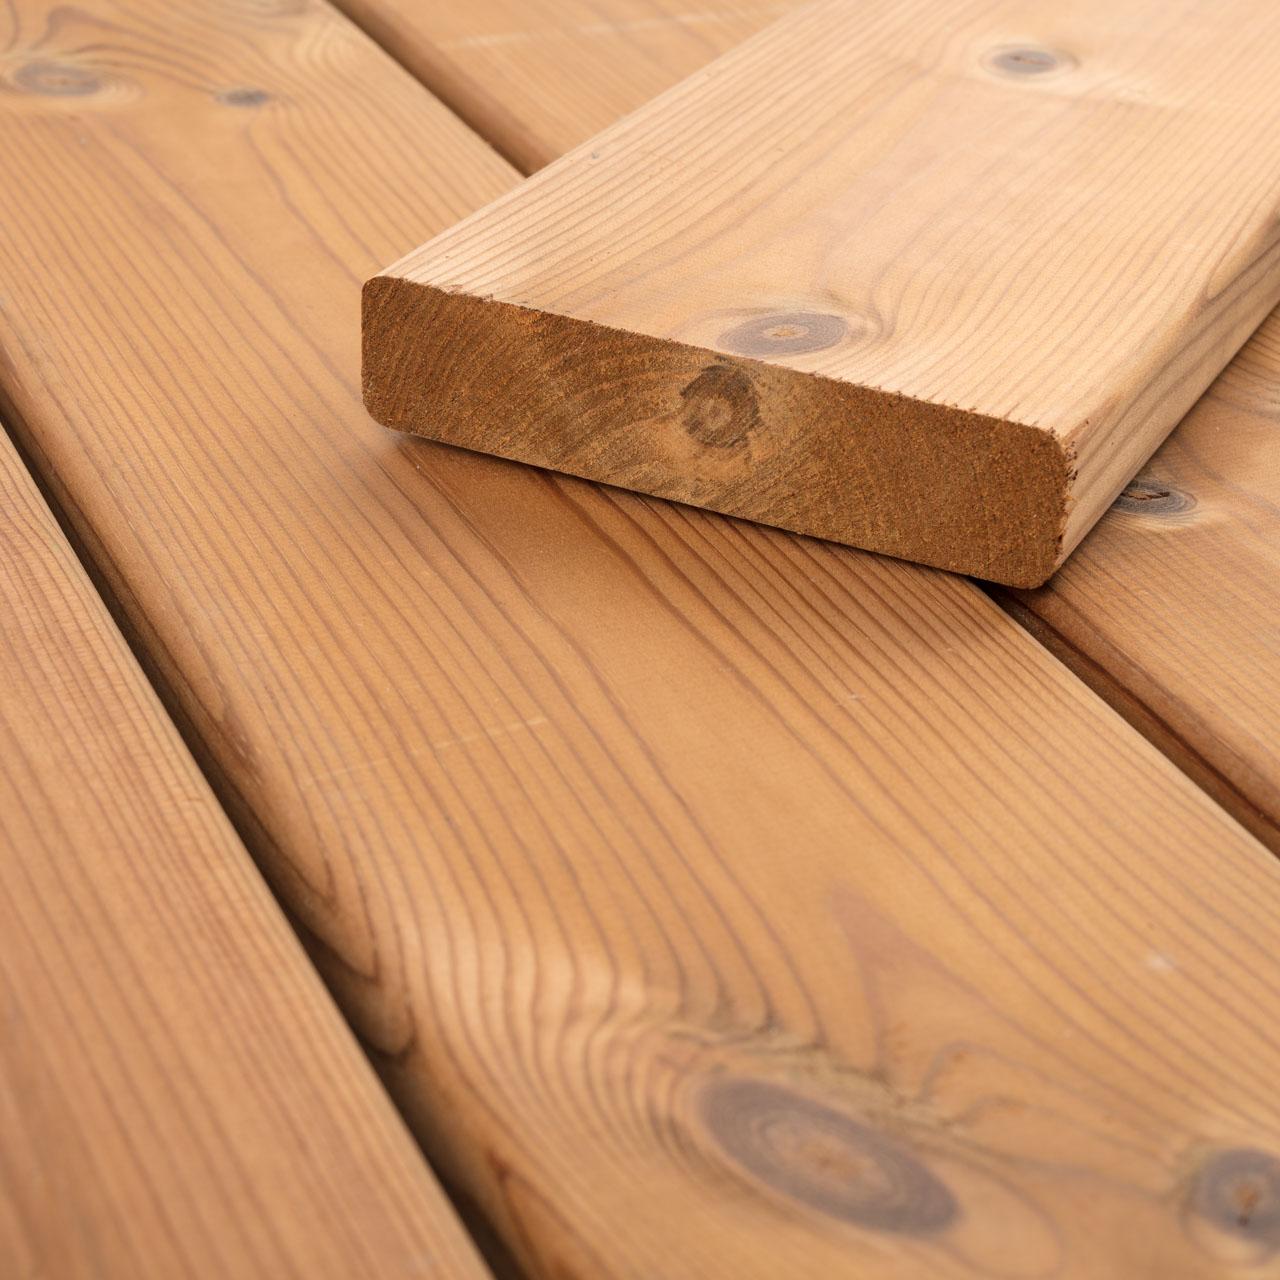 FANO Holz Terrassendiele Thermo Kiefer, glatt, teak geölt, 20 ...